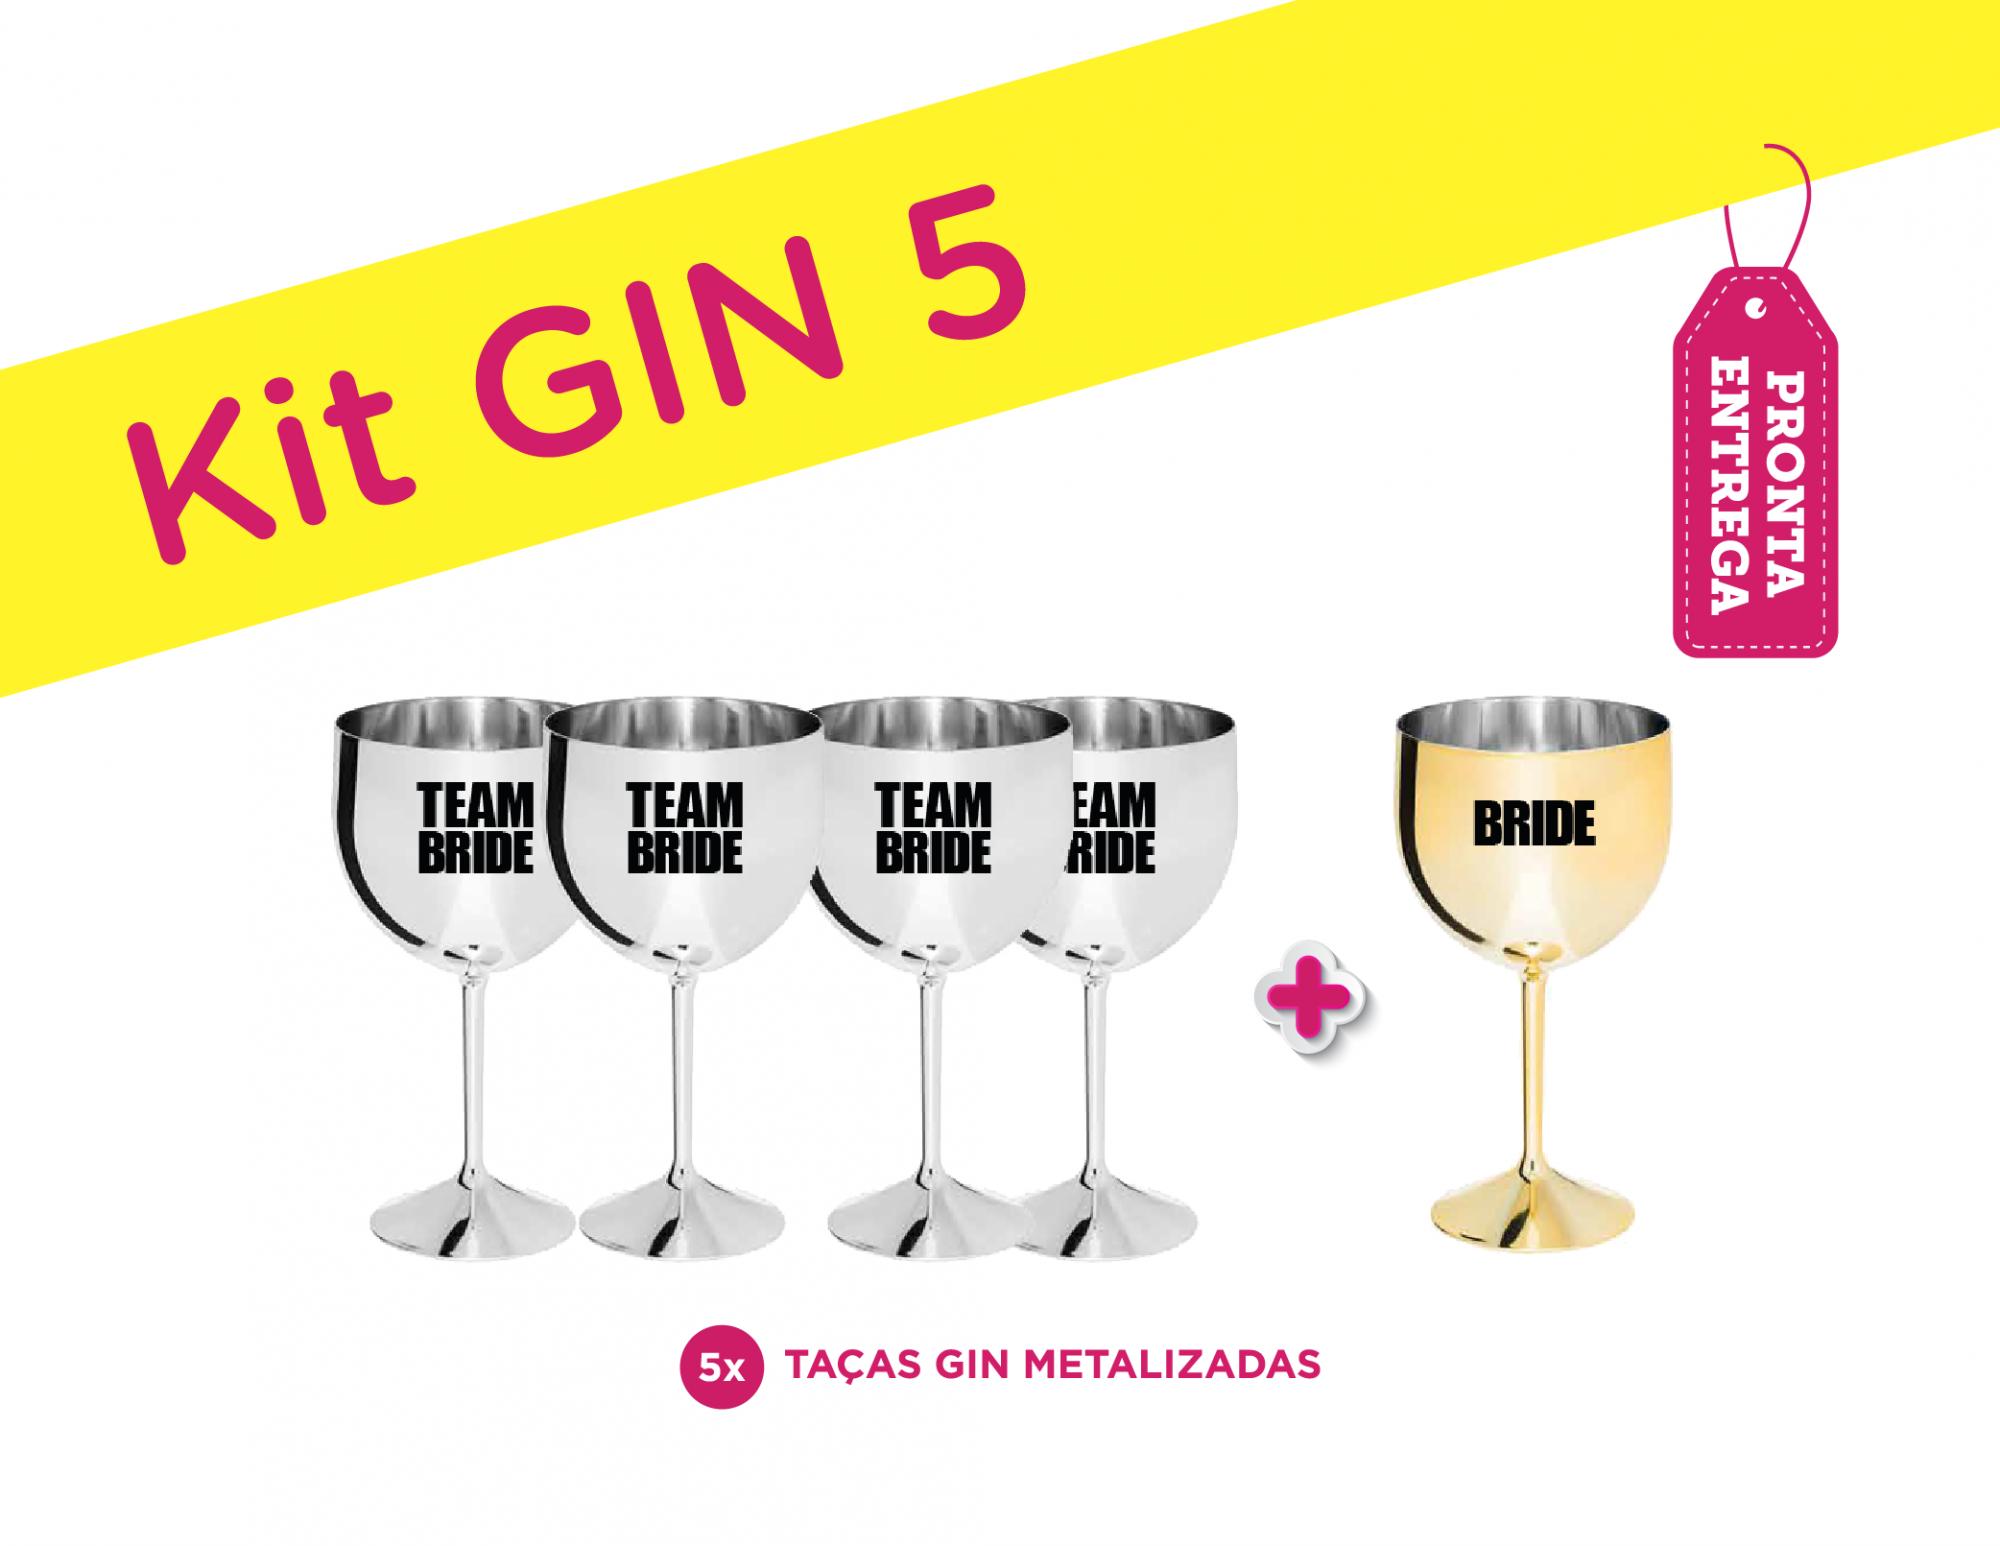 Kit Gin 5 Metalizado Bride/Team Bride Pronta Entrega para Despedida de Solteira